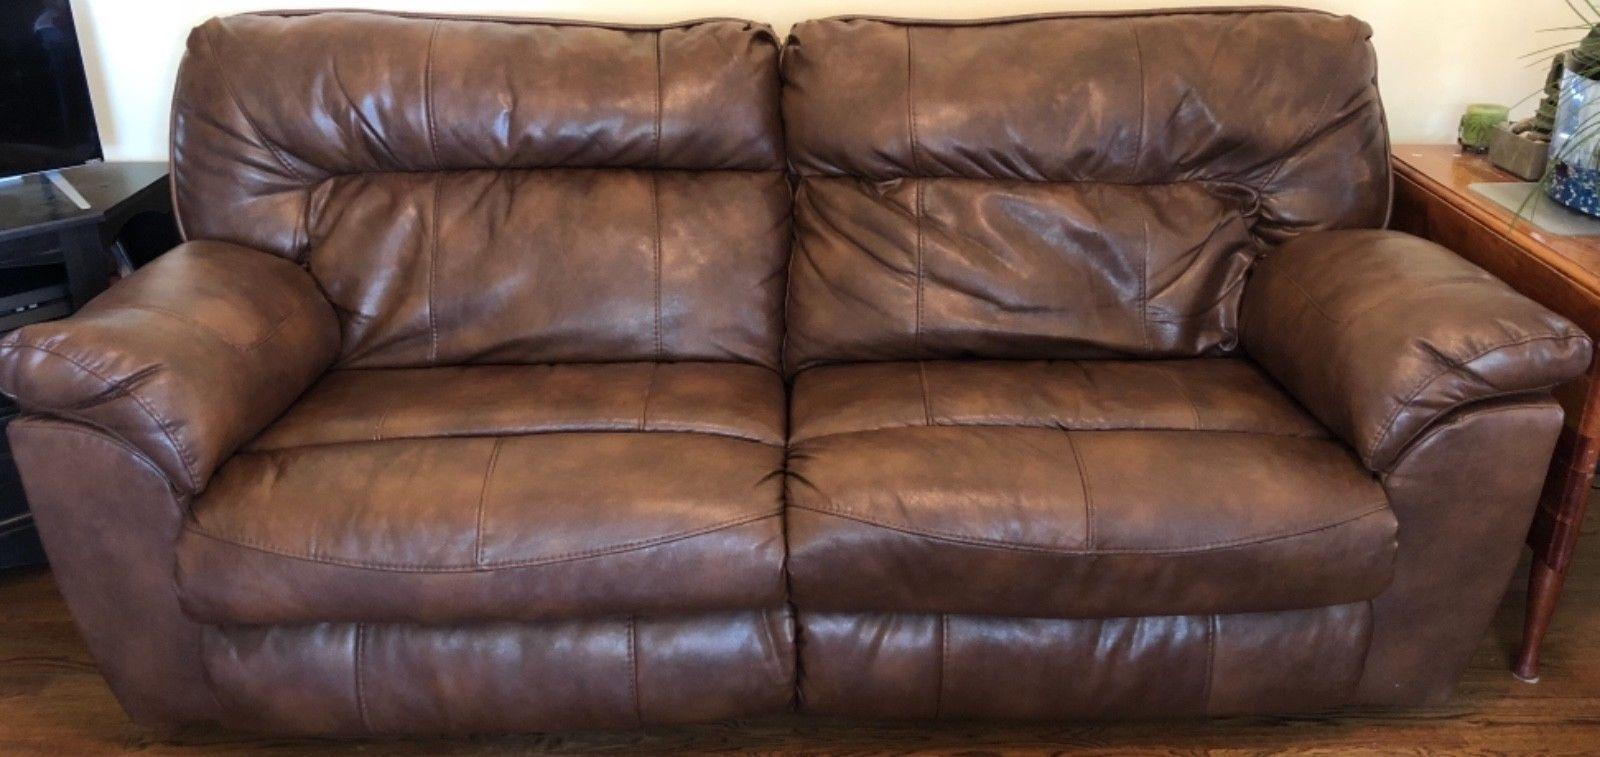 Remarkable 750 00 Catnapper Nolan Power Extra Wide Reclining Sofa Inzonedesignstudio Interior Chair Design Inzonedesignstudiocom